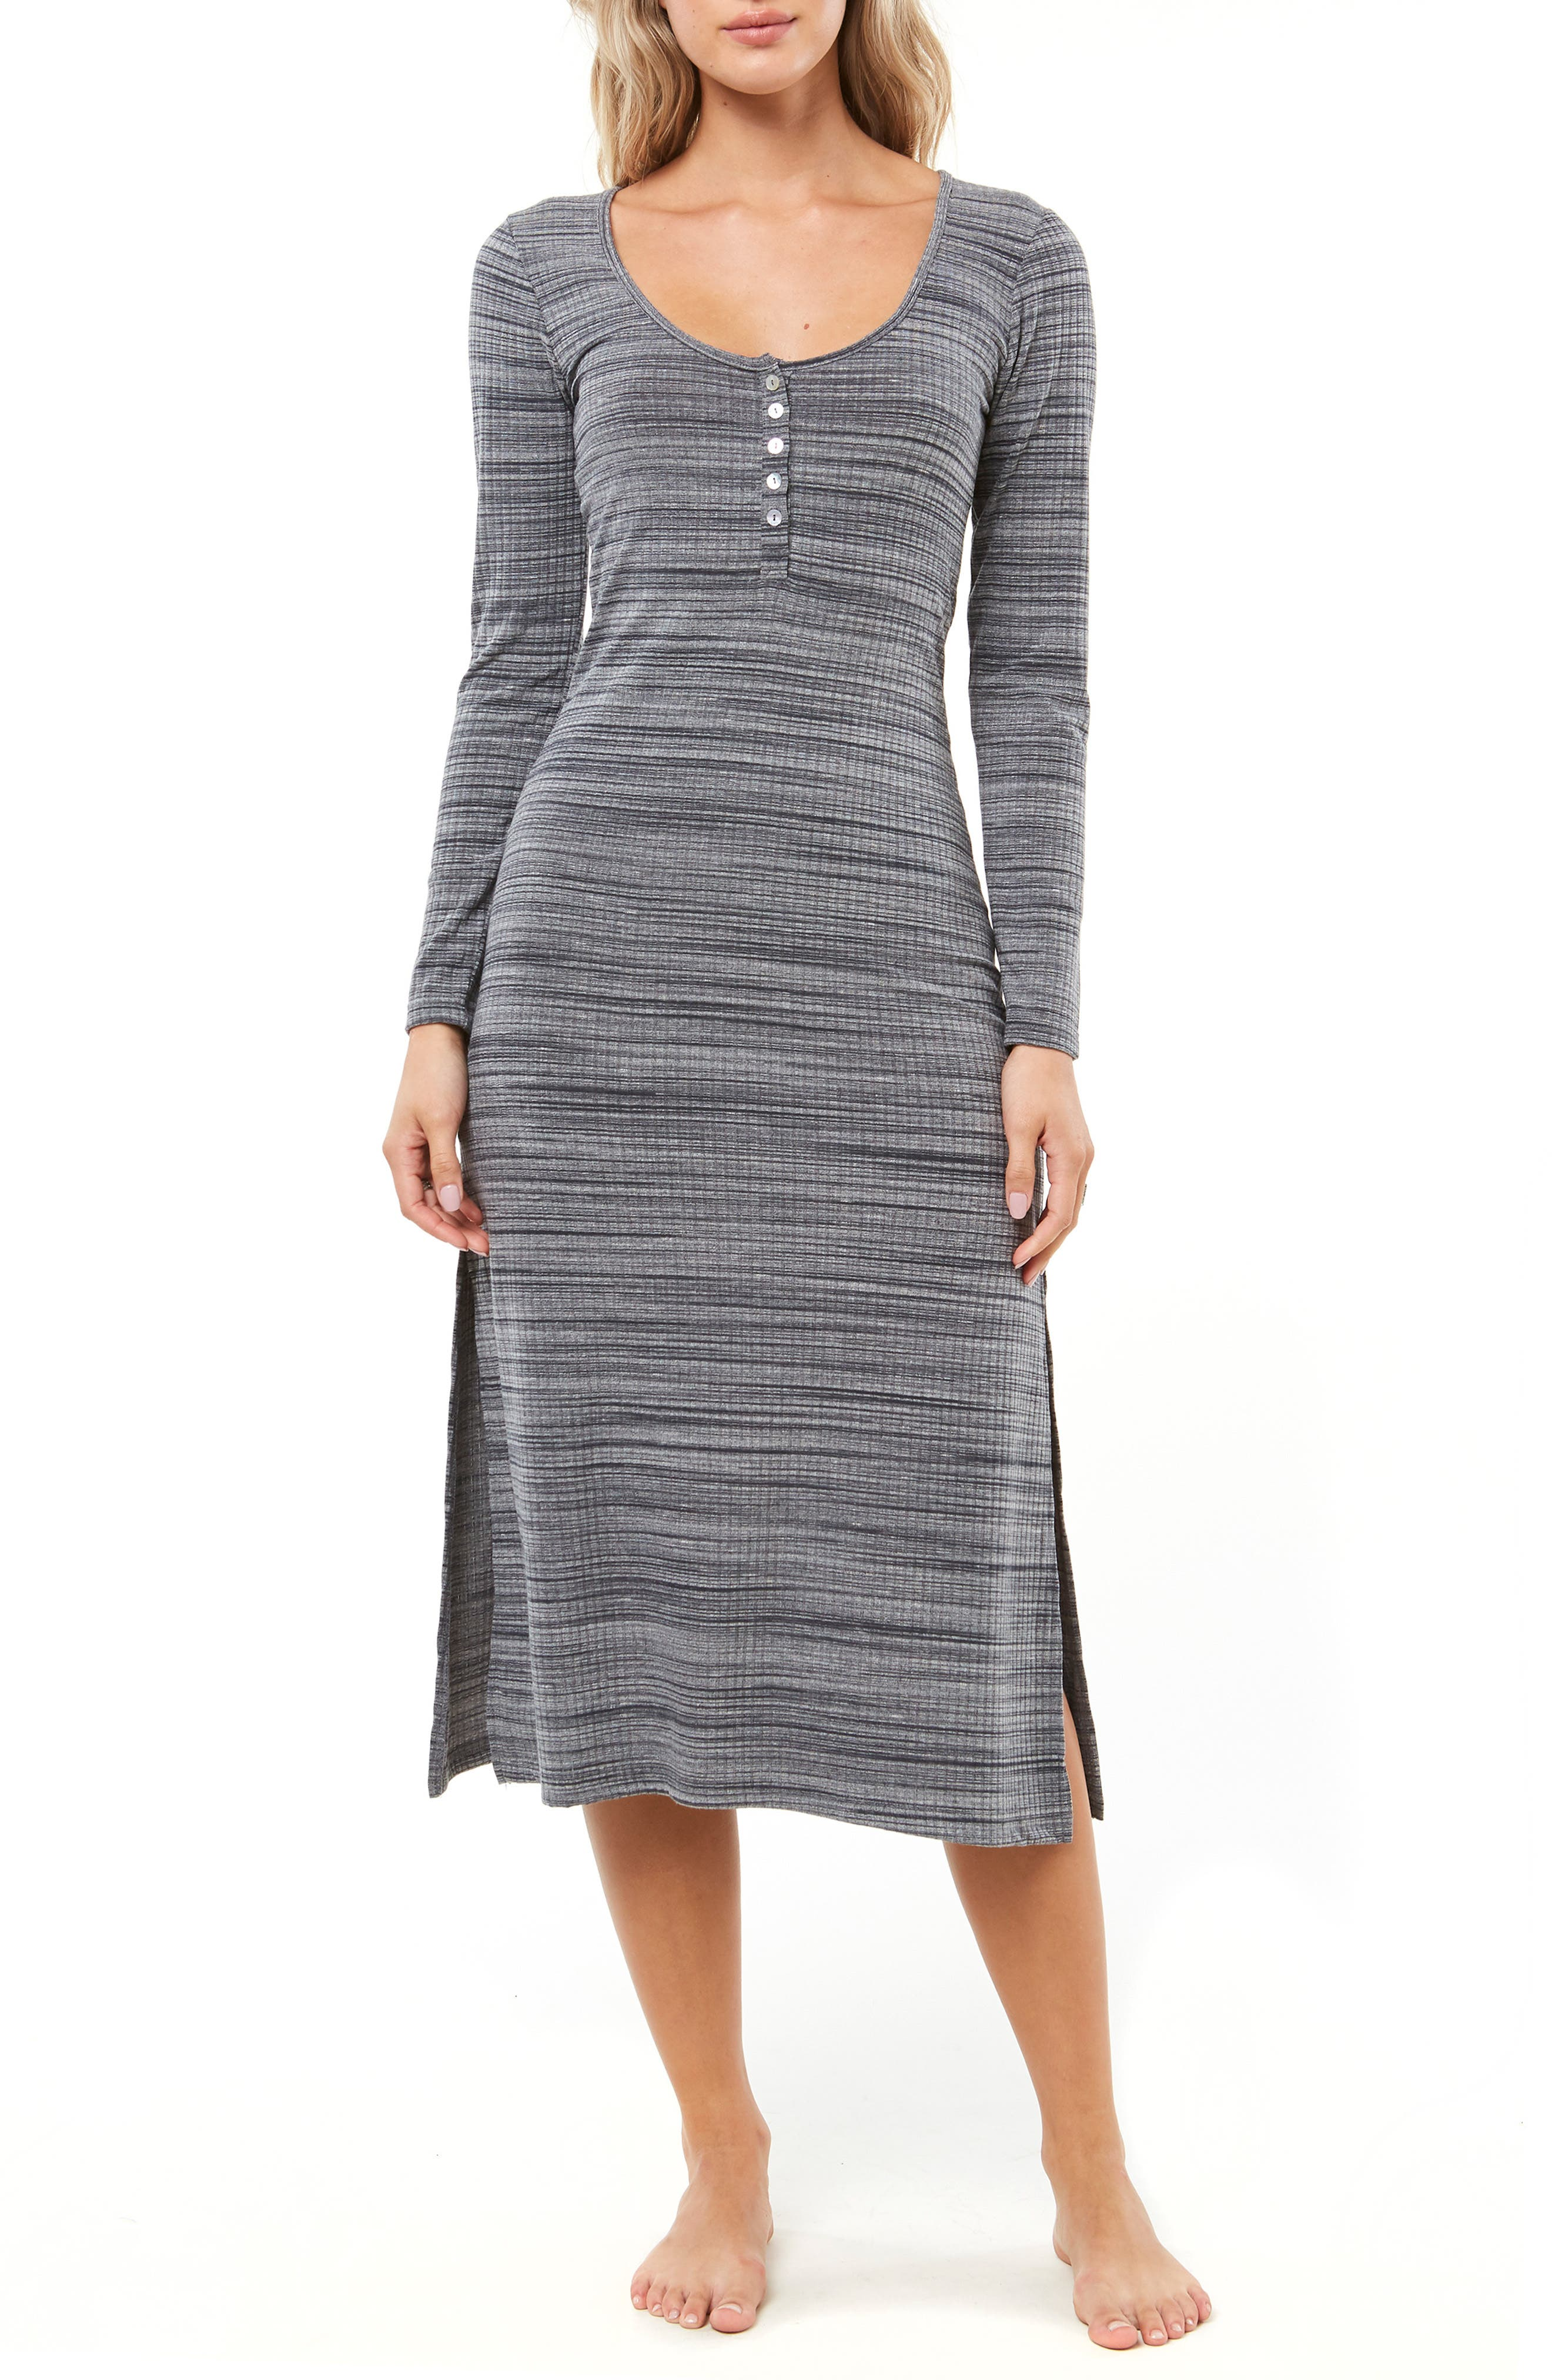 Shellsea Knit Midi Dress,                             Main thumbnail 1, color,                             INDIAN TEAL